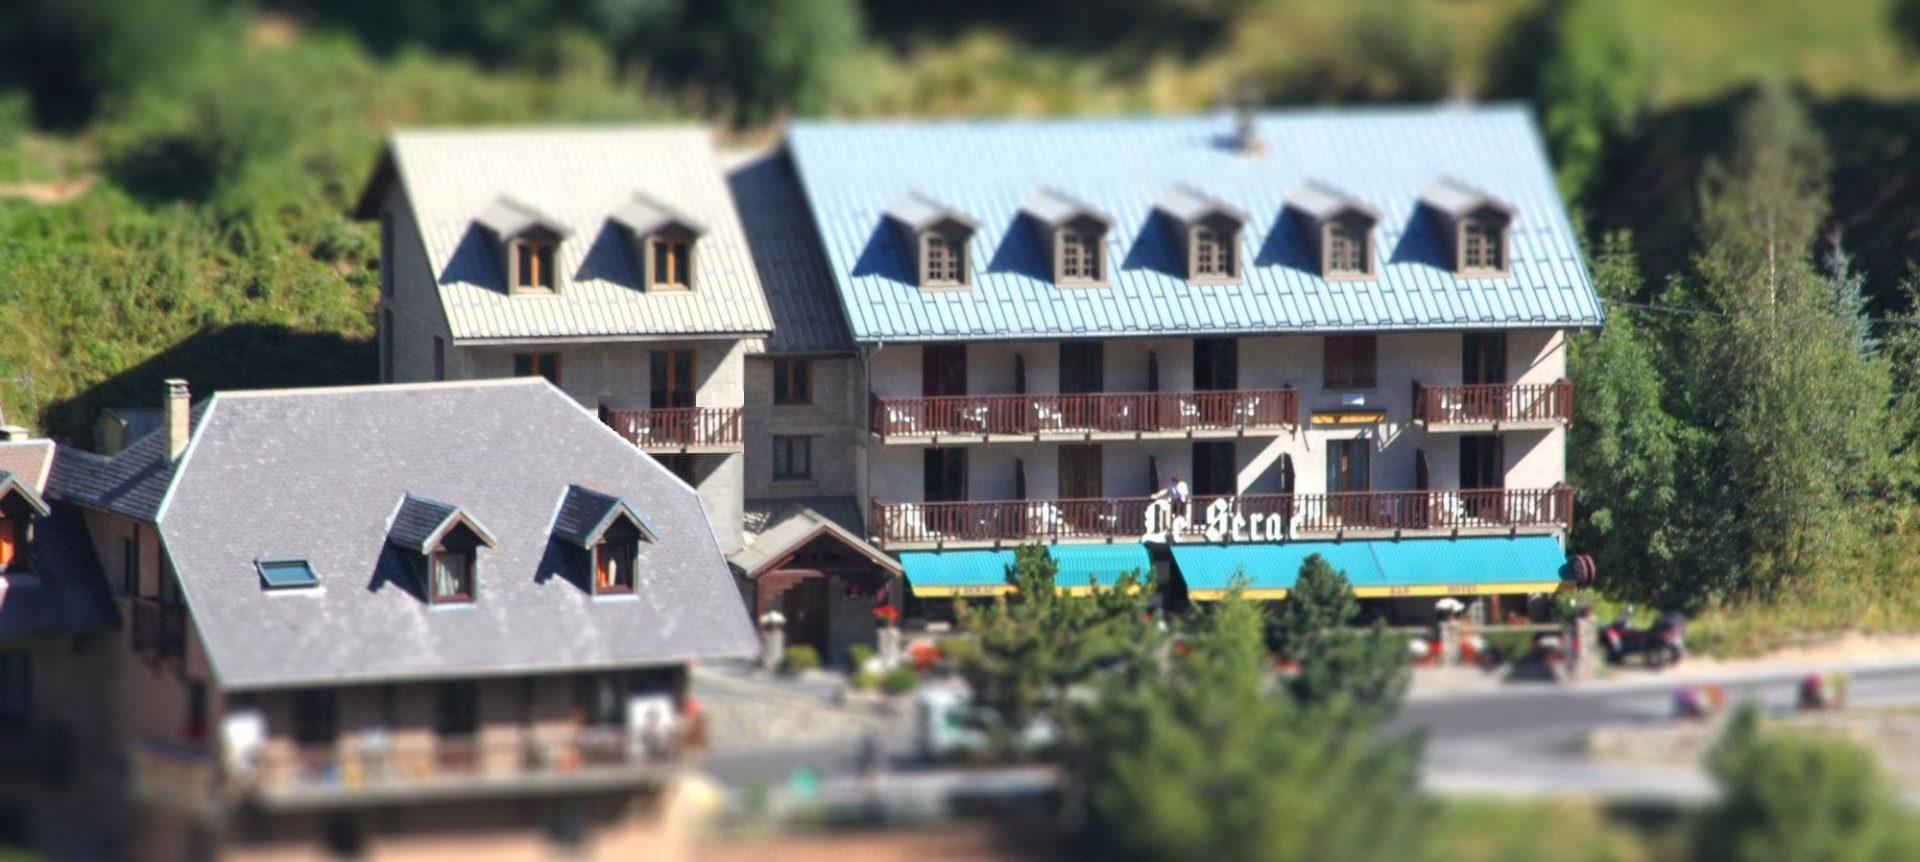 Hotel Restaurant Le Serac La Grave La Meije Hautes Alpes